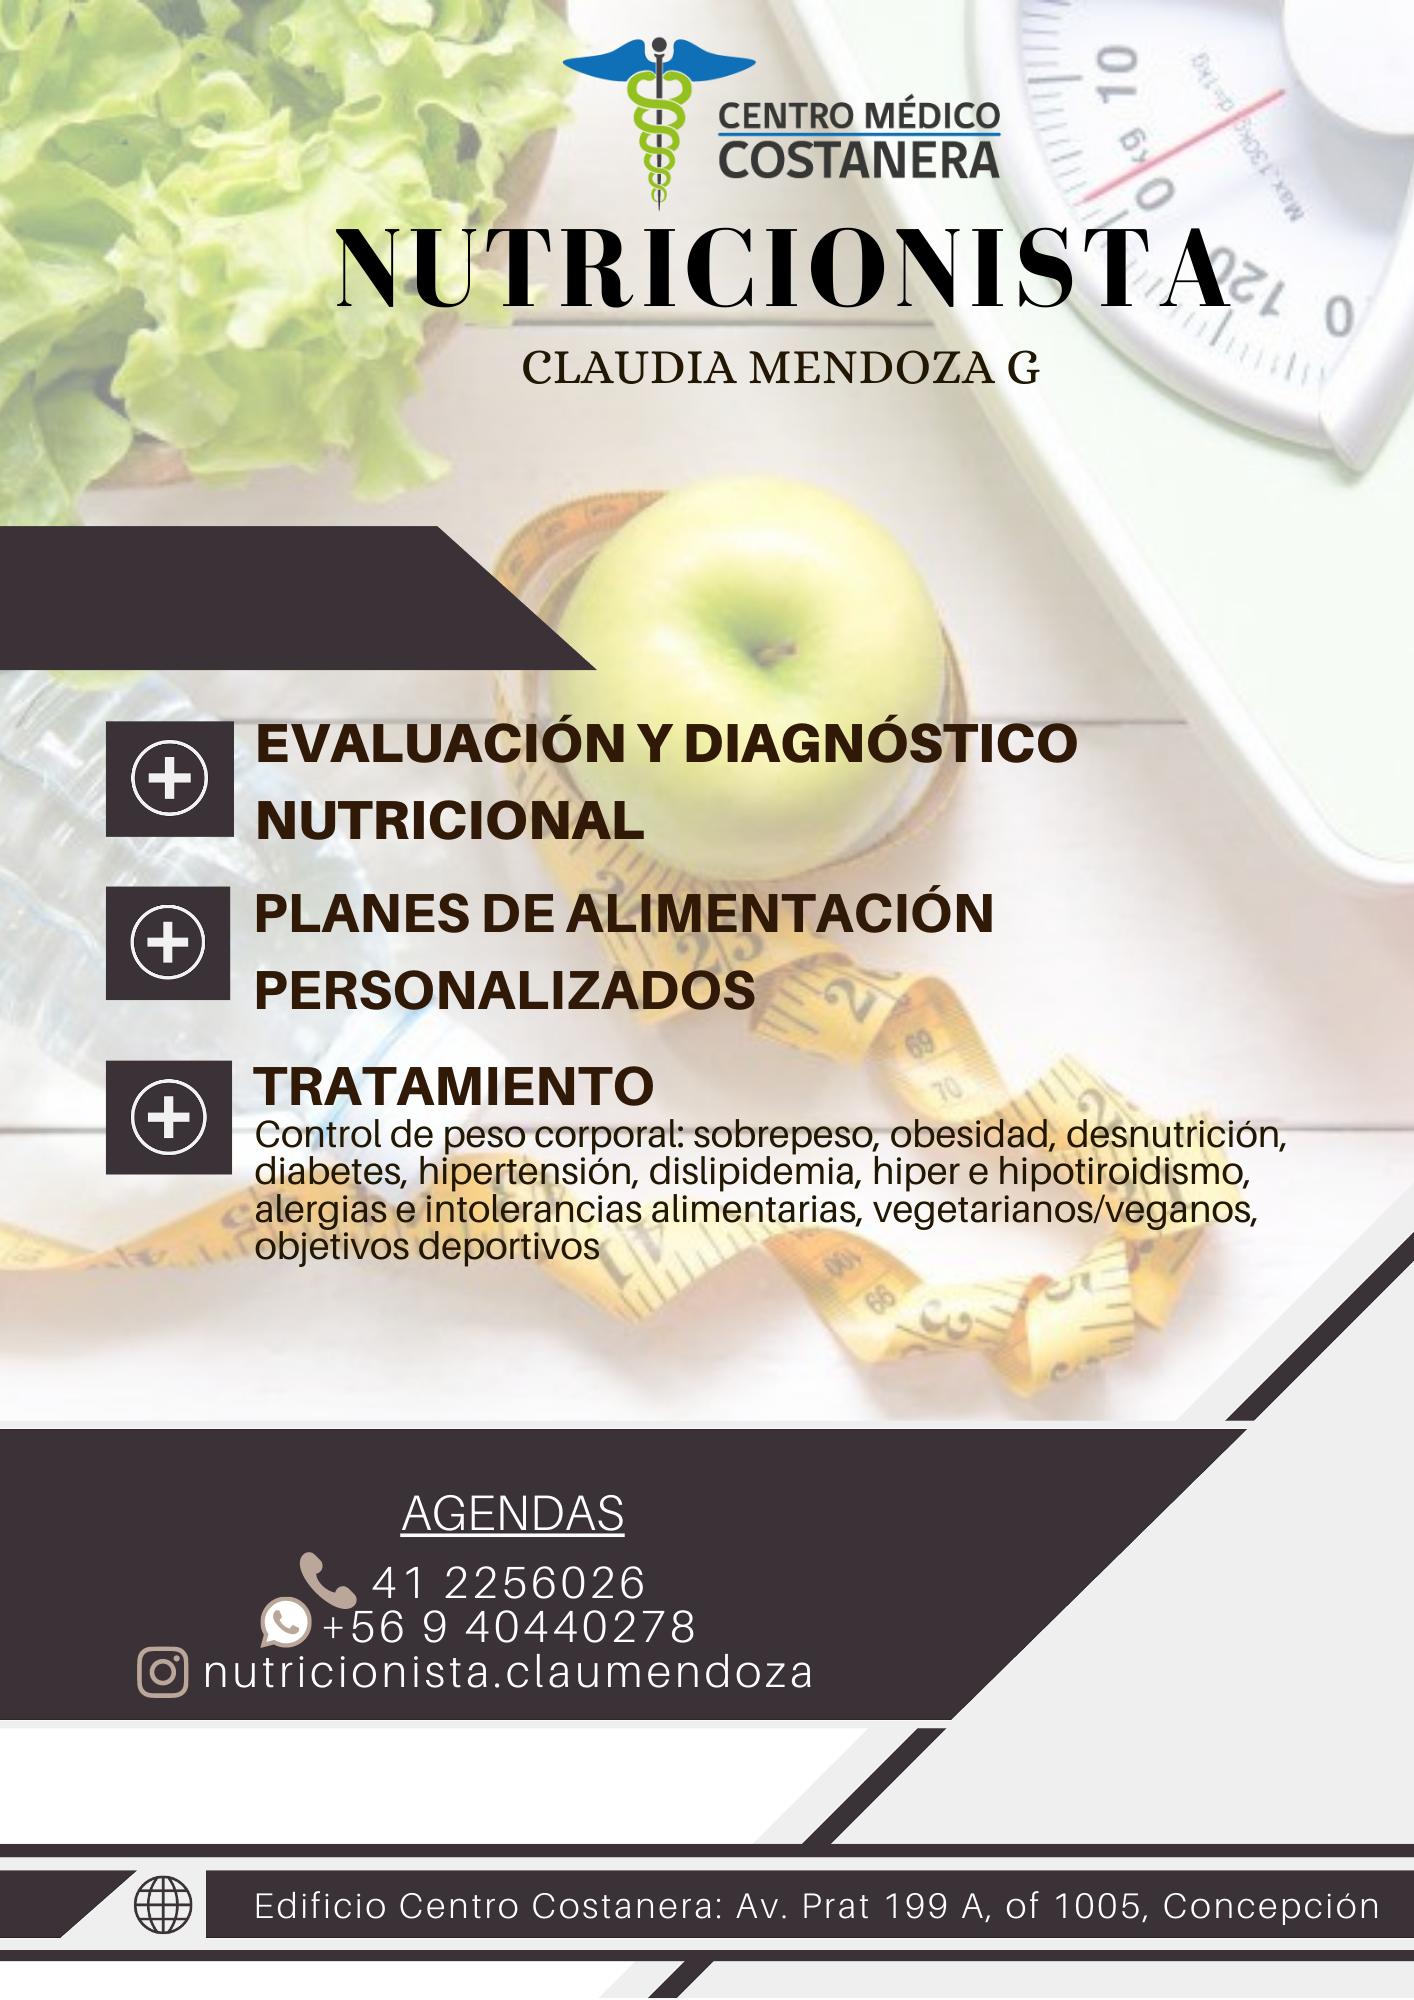 Claudia Mendoza Nutricionista